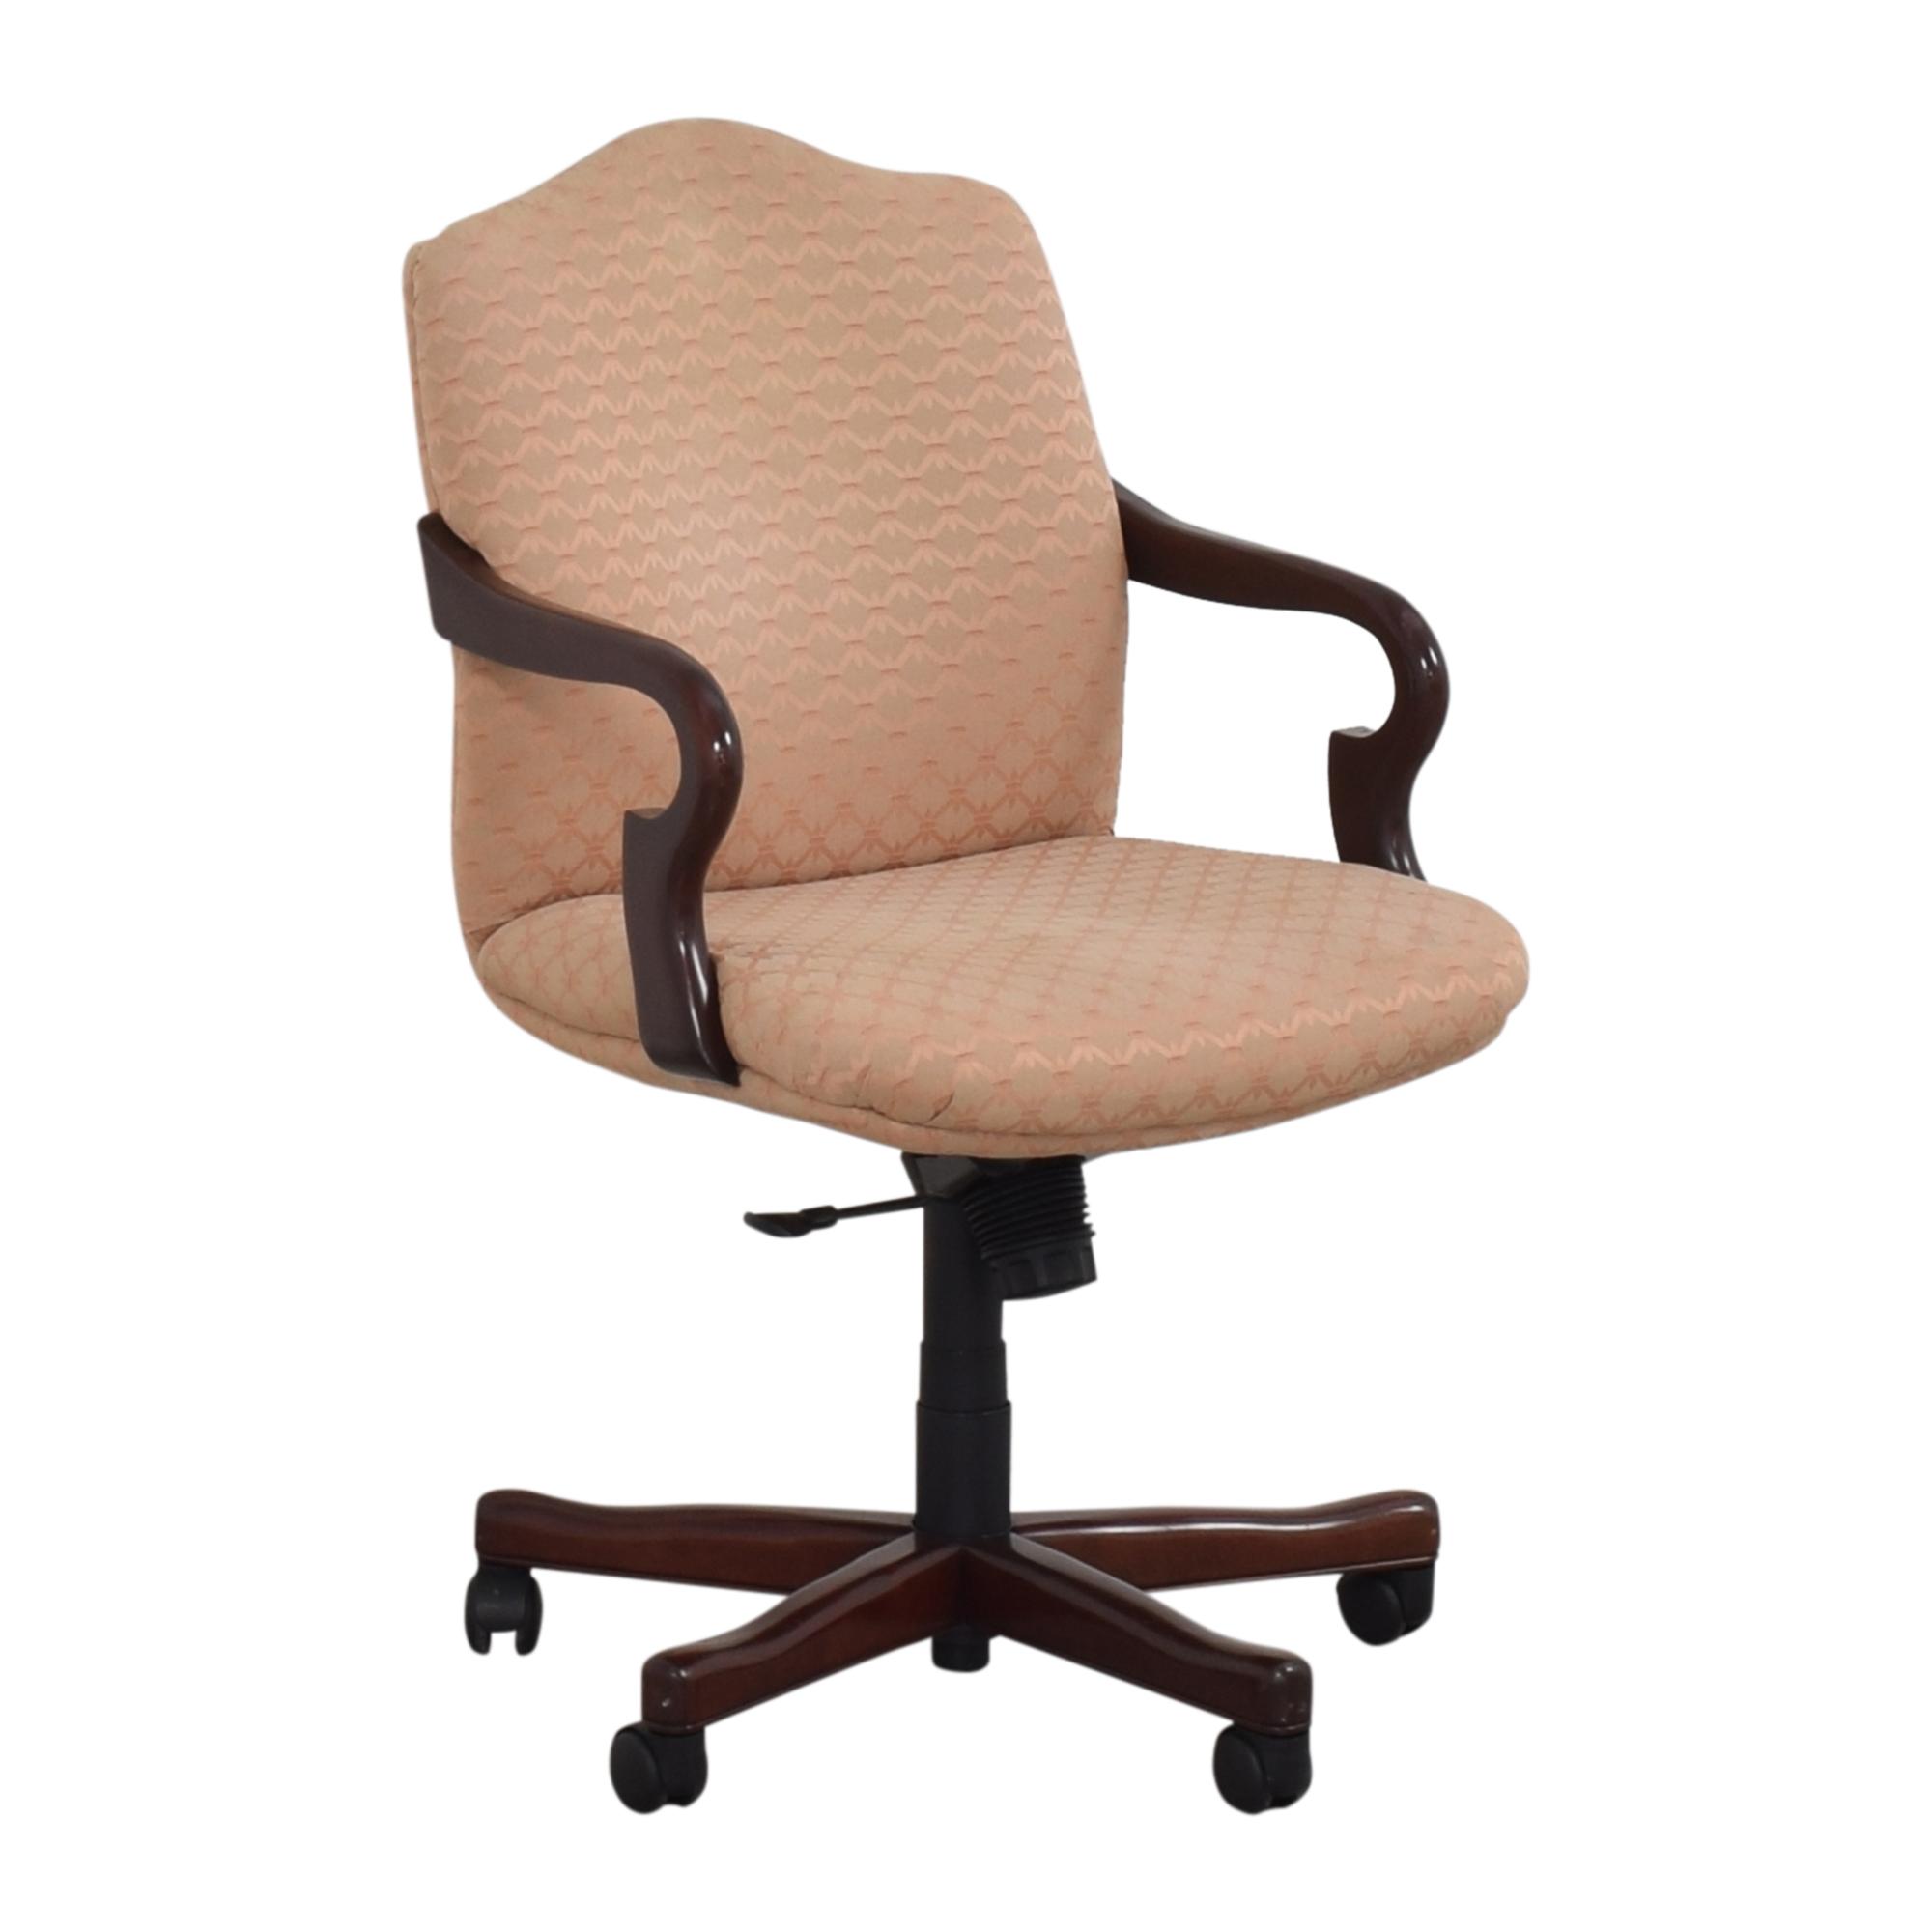 Jofco Jofco Swivel Tilt Office Chair nyc